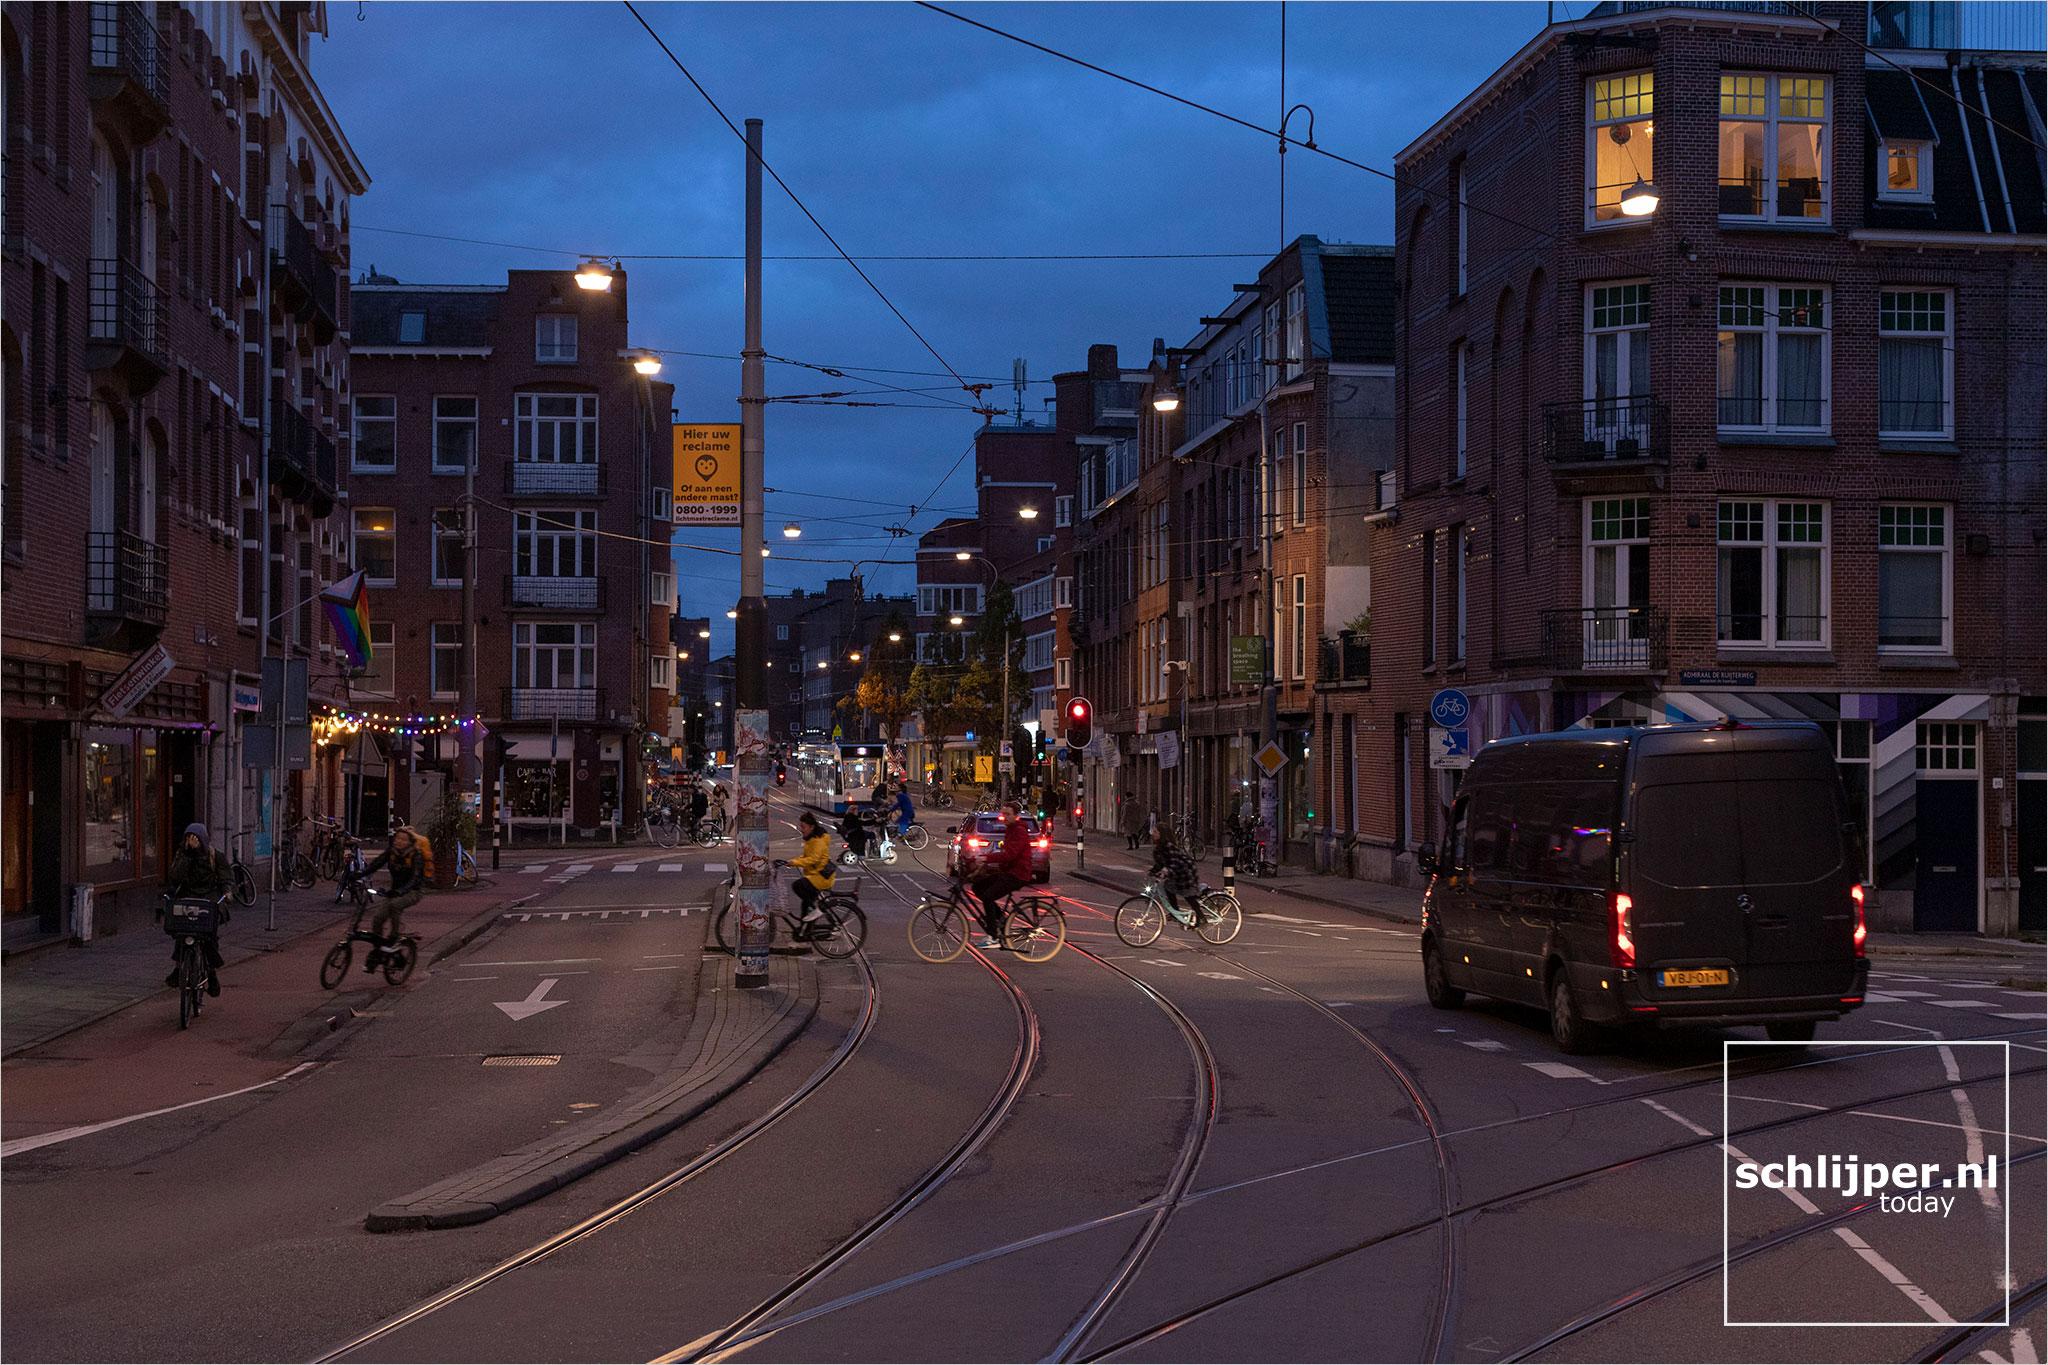 The Netherlands, Amsterdam, 11 oktober 2021